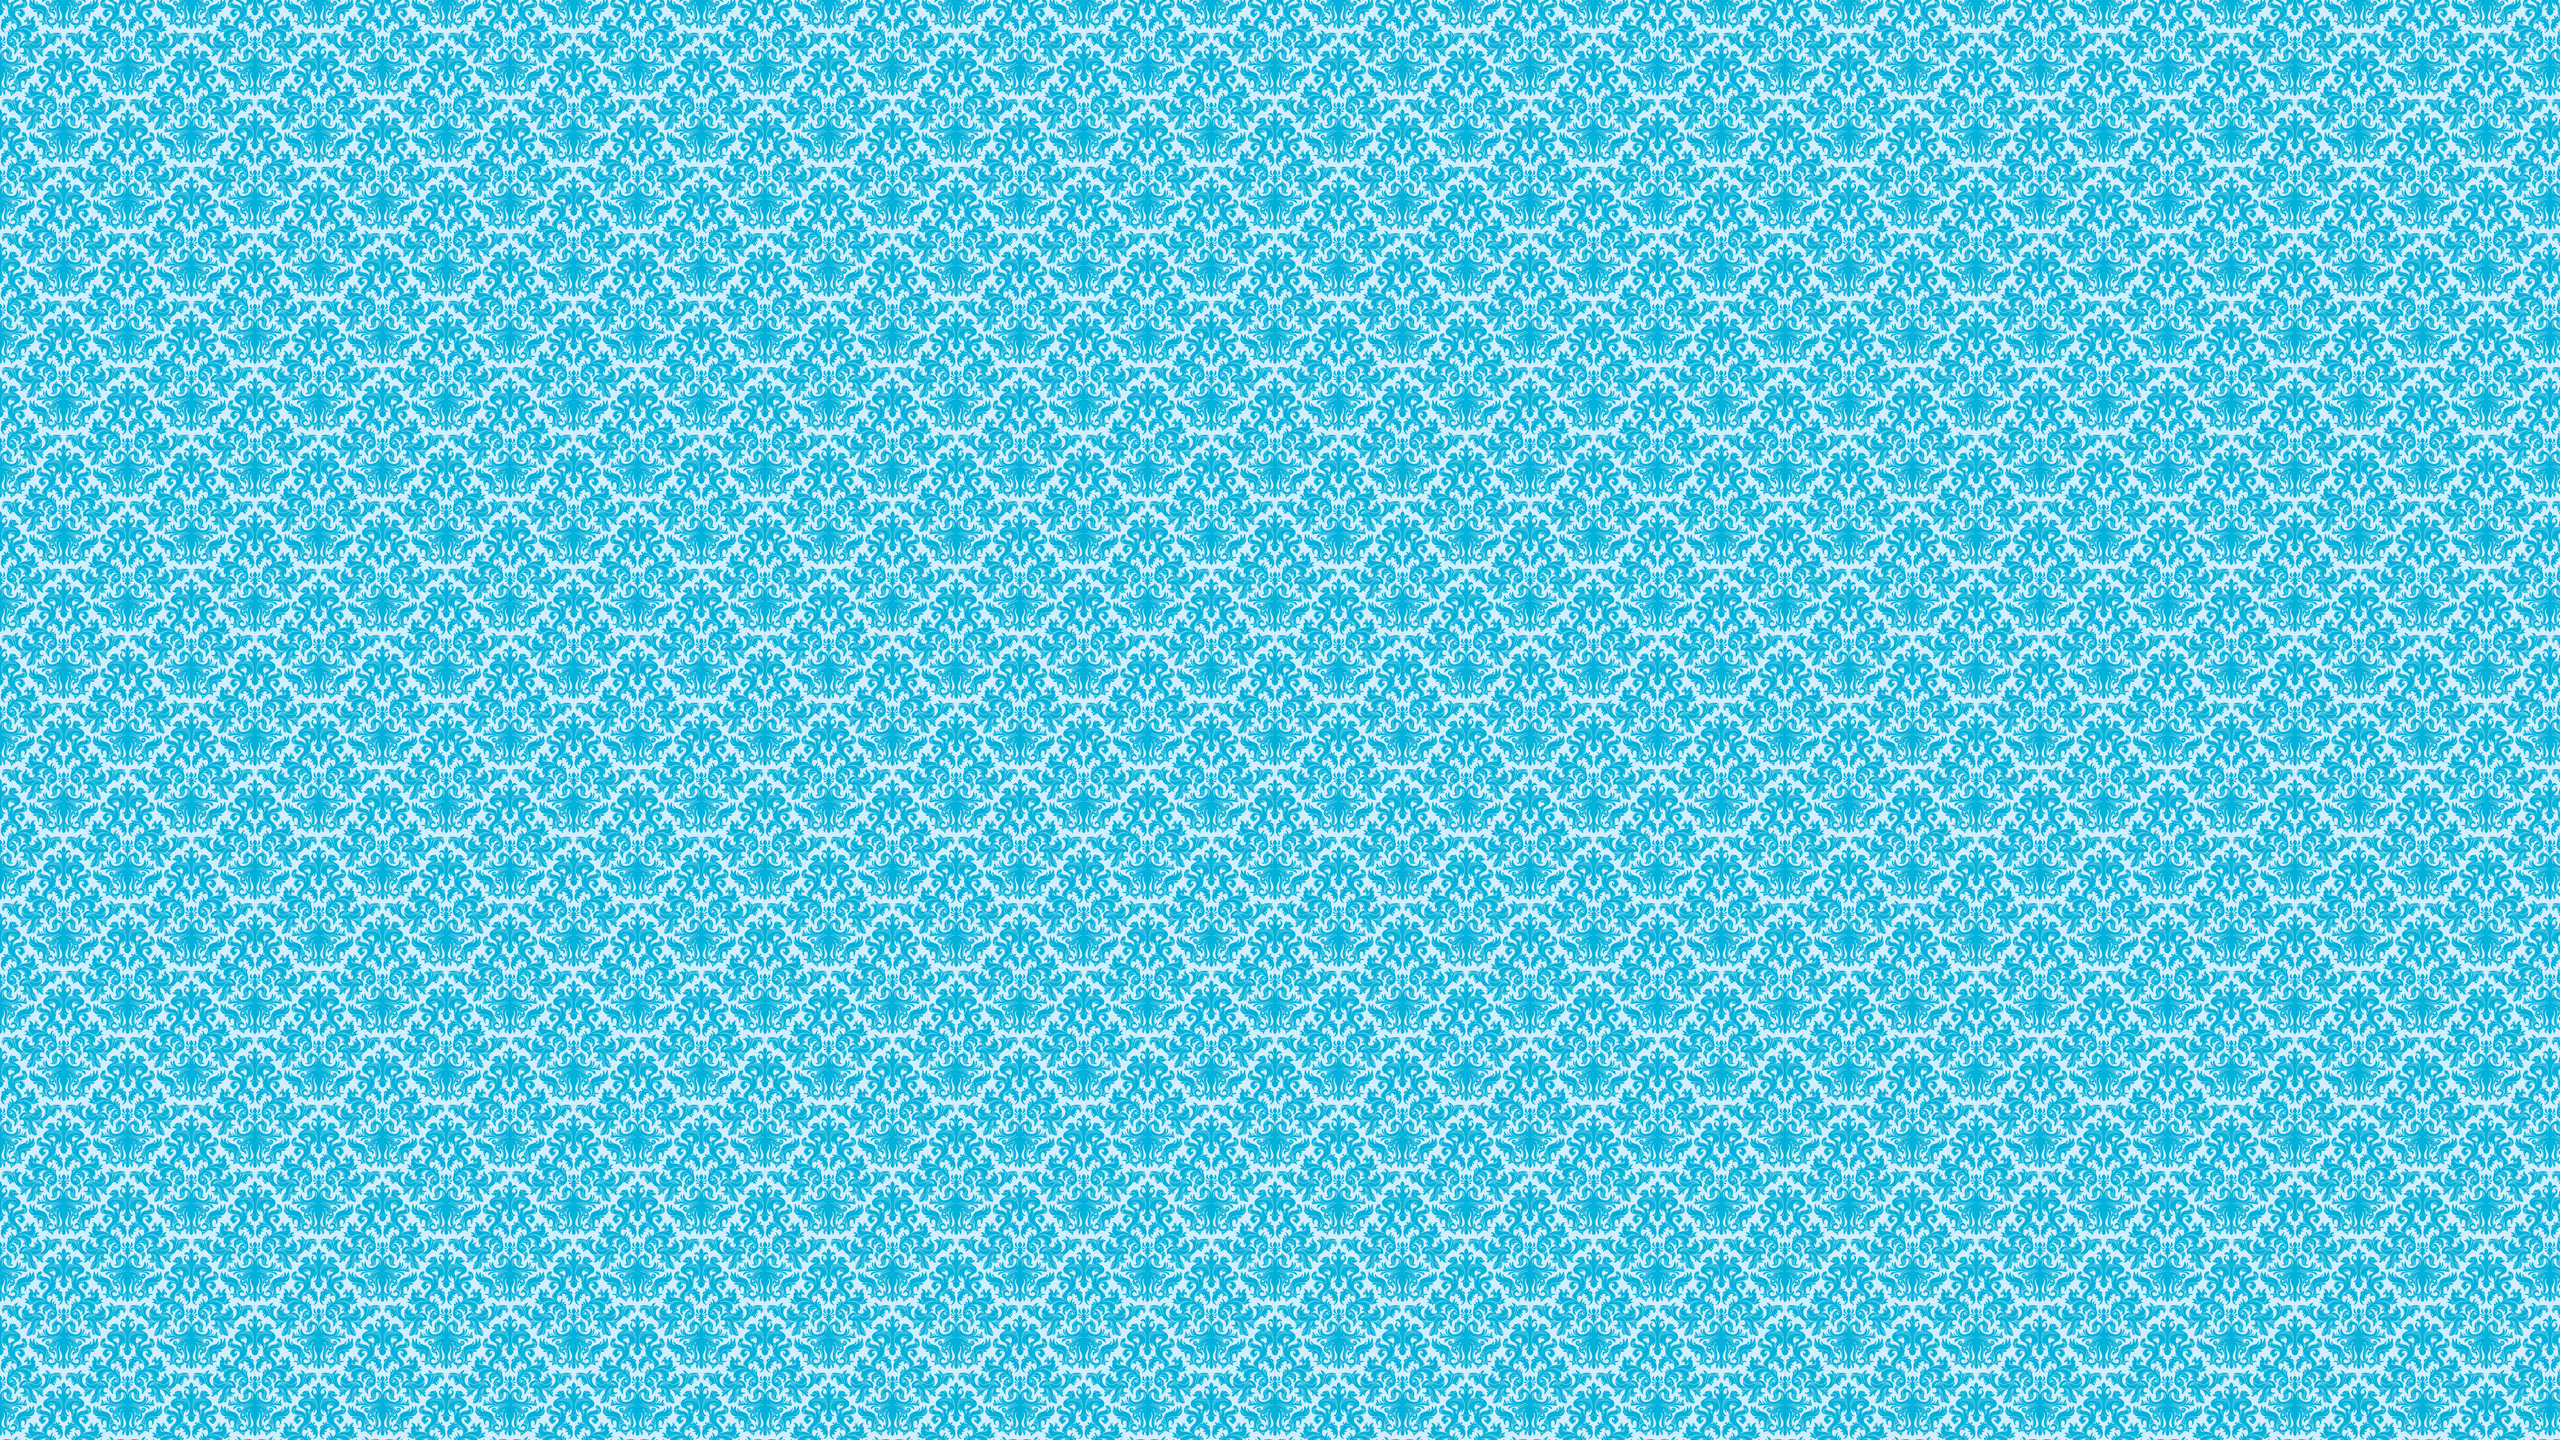 wallpaper installing this blue chocolate vintage desktop wallpaper is 2560x1440